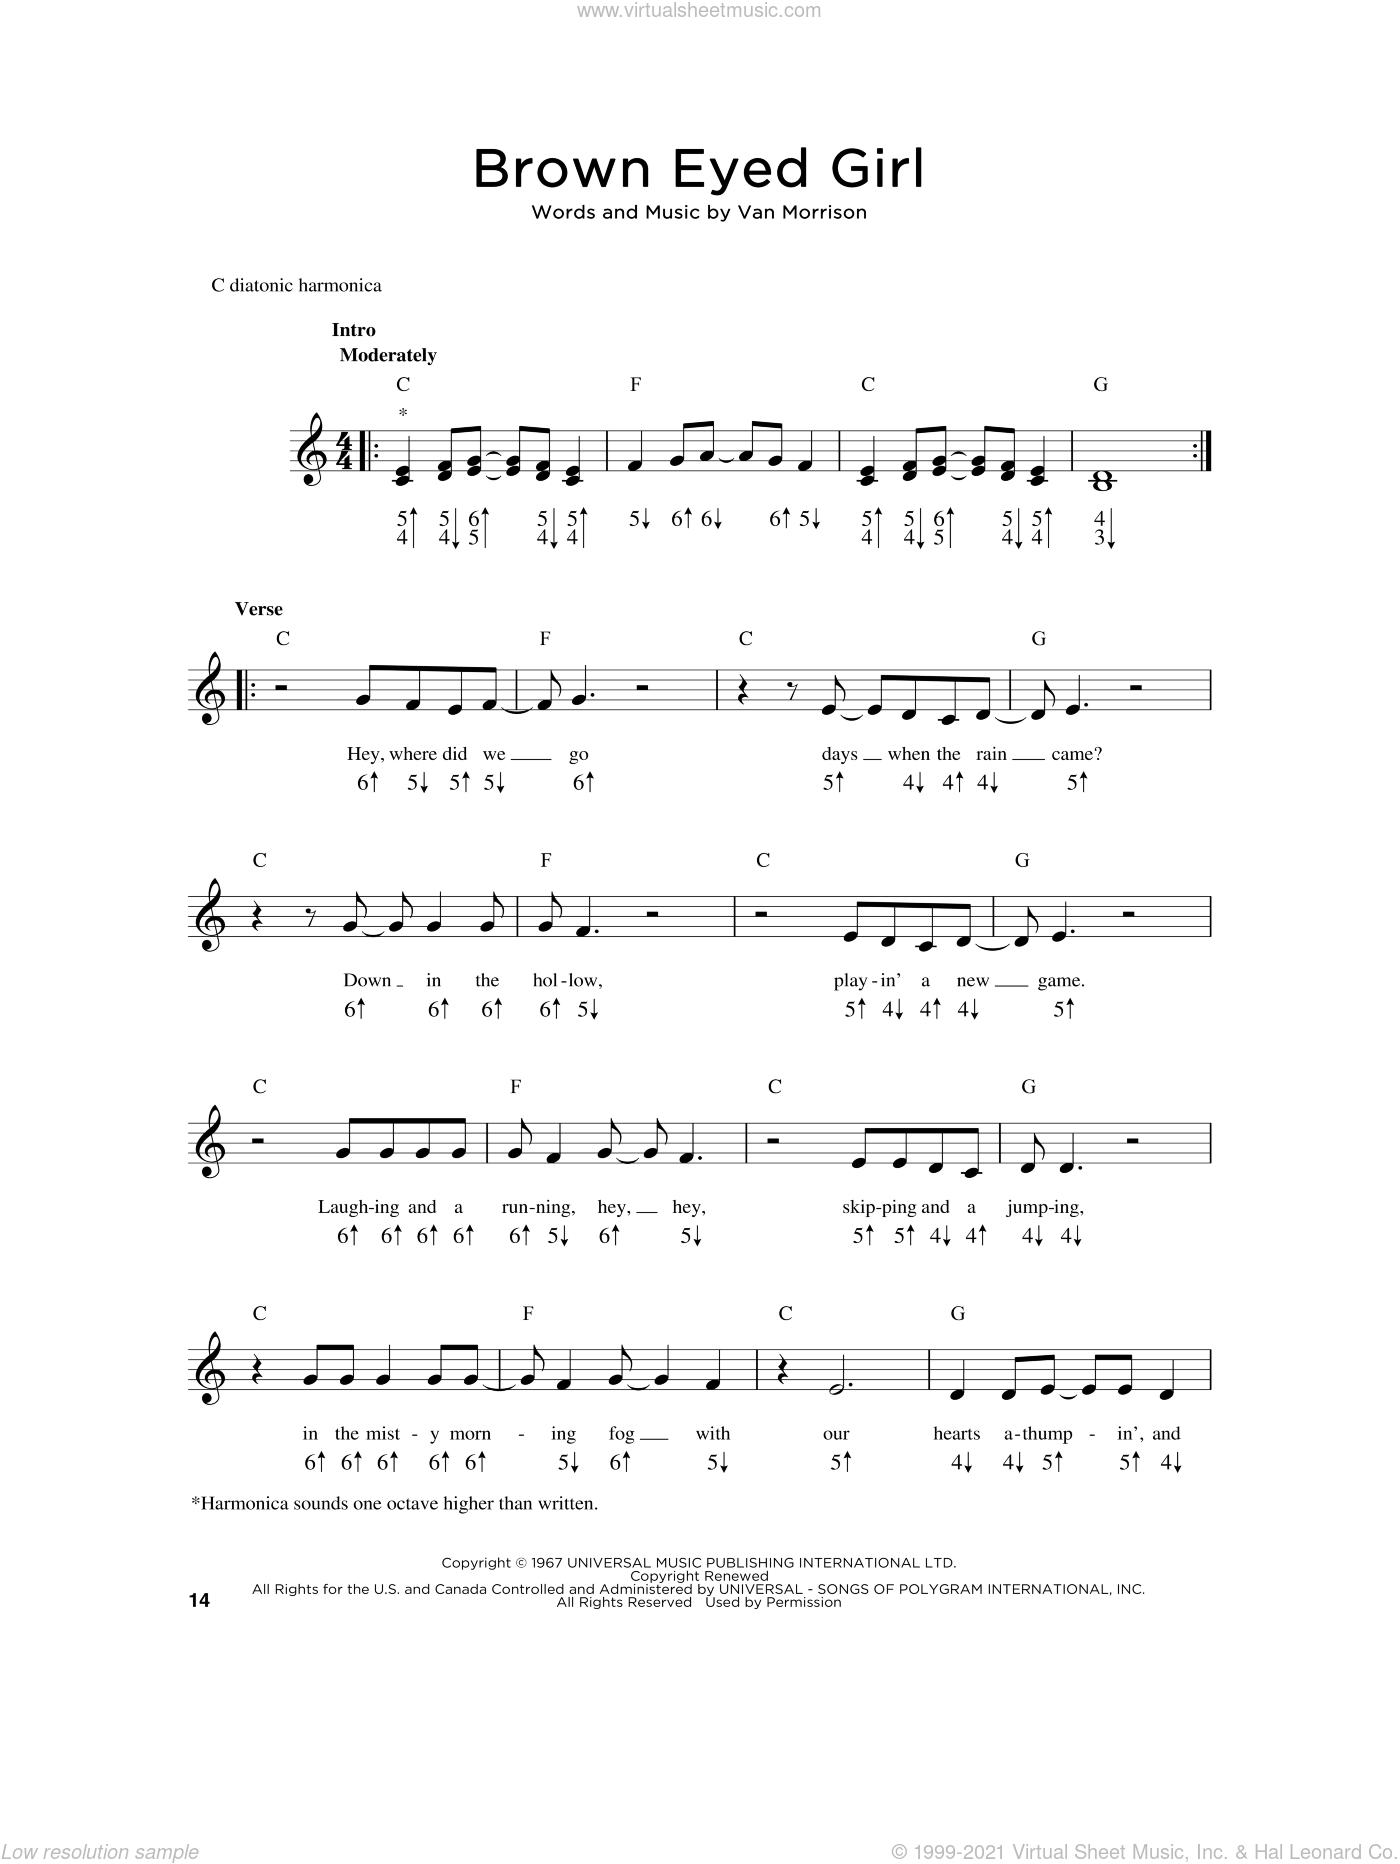 Brown Eyed Girl sheet music for harmonica solo by Van Morrison, intermediate skill level